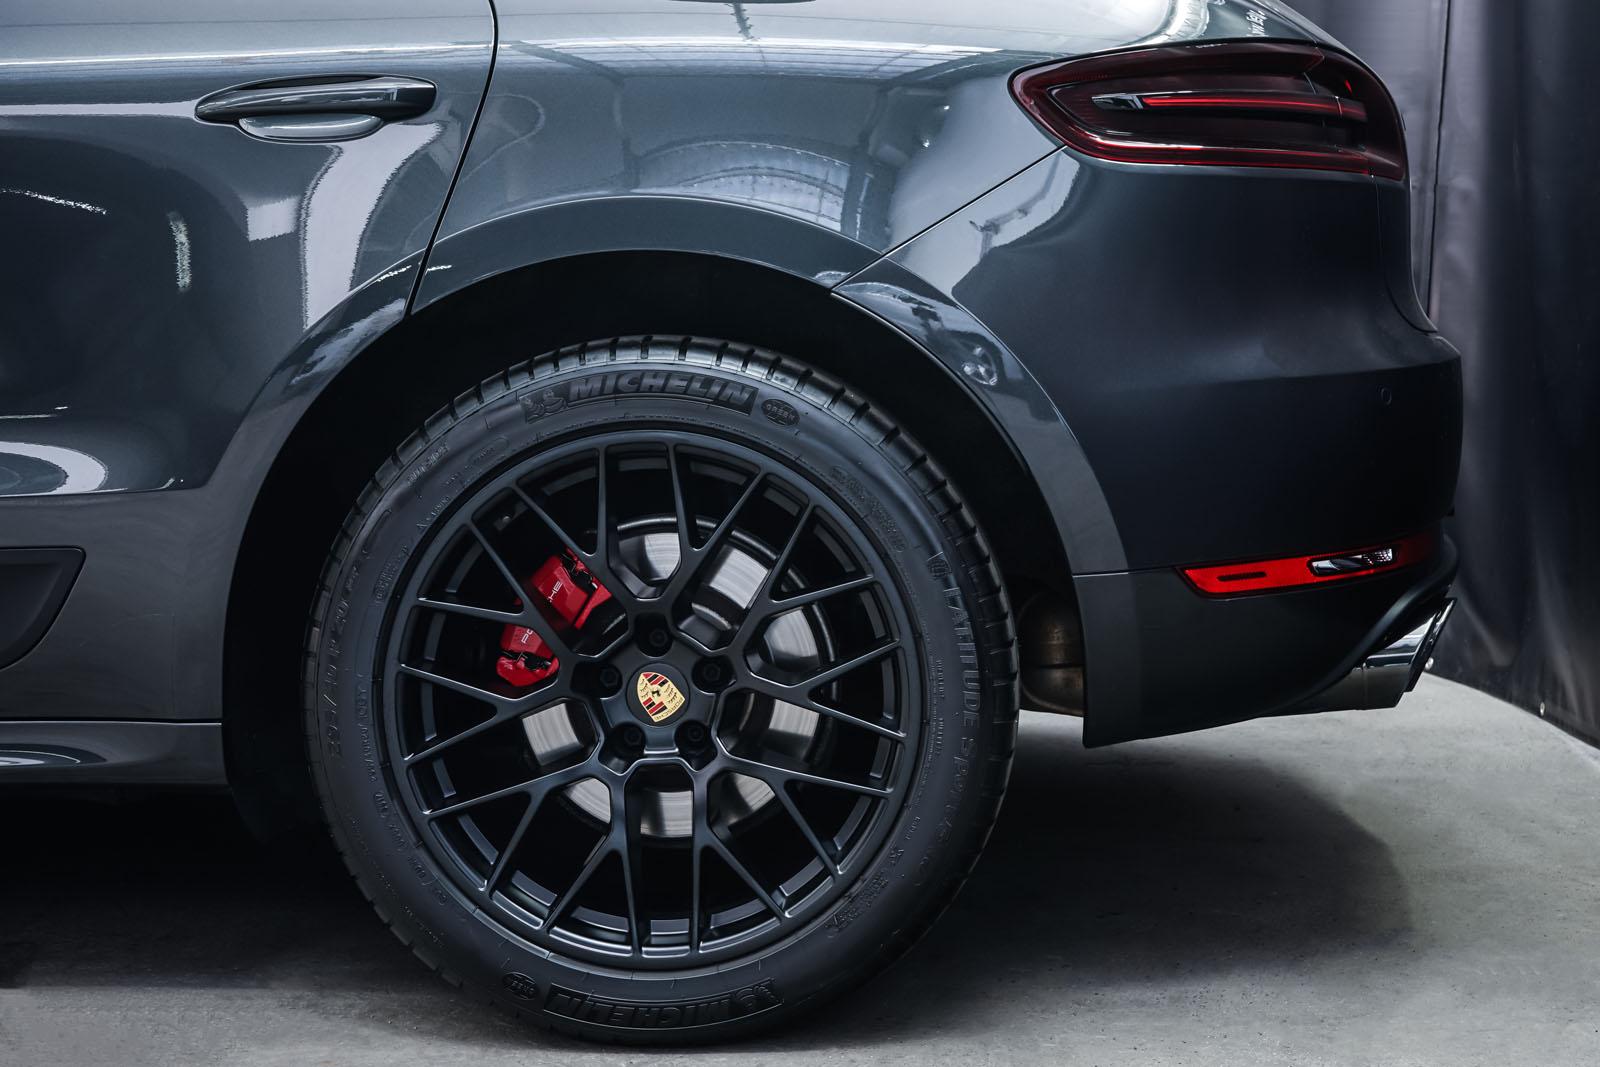 Porsche_Macan_GTS_Dunkelgrau_Schwarz_POR-8174_4_w